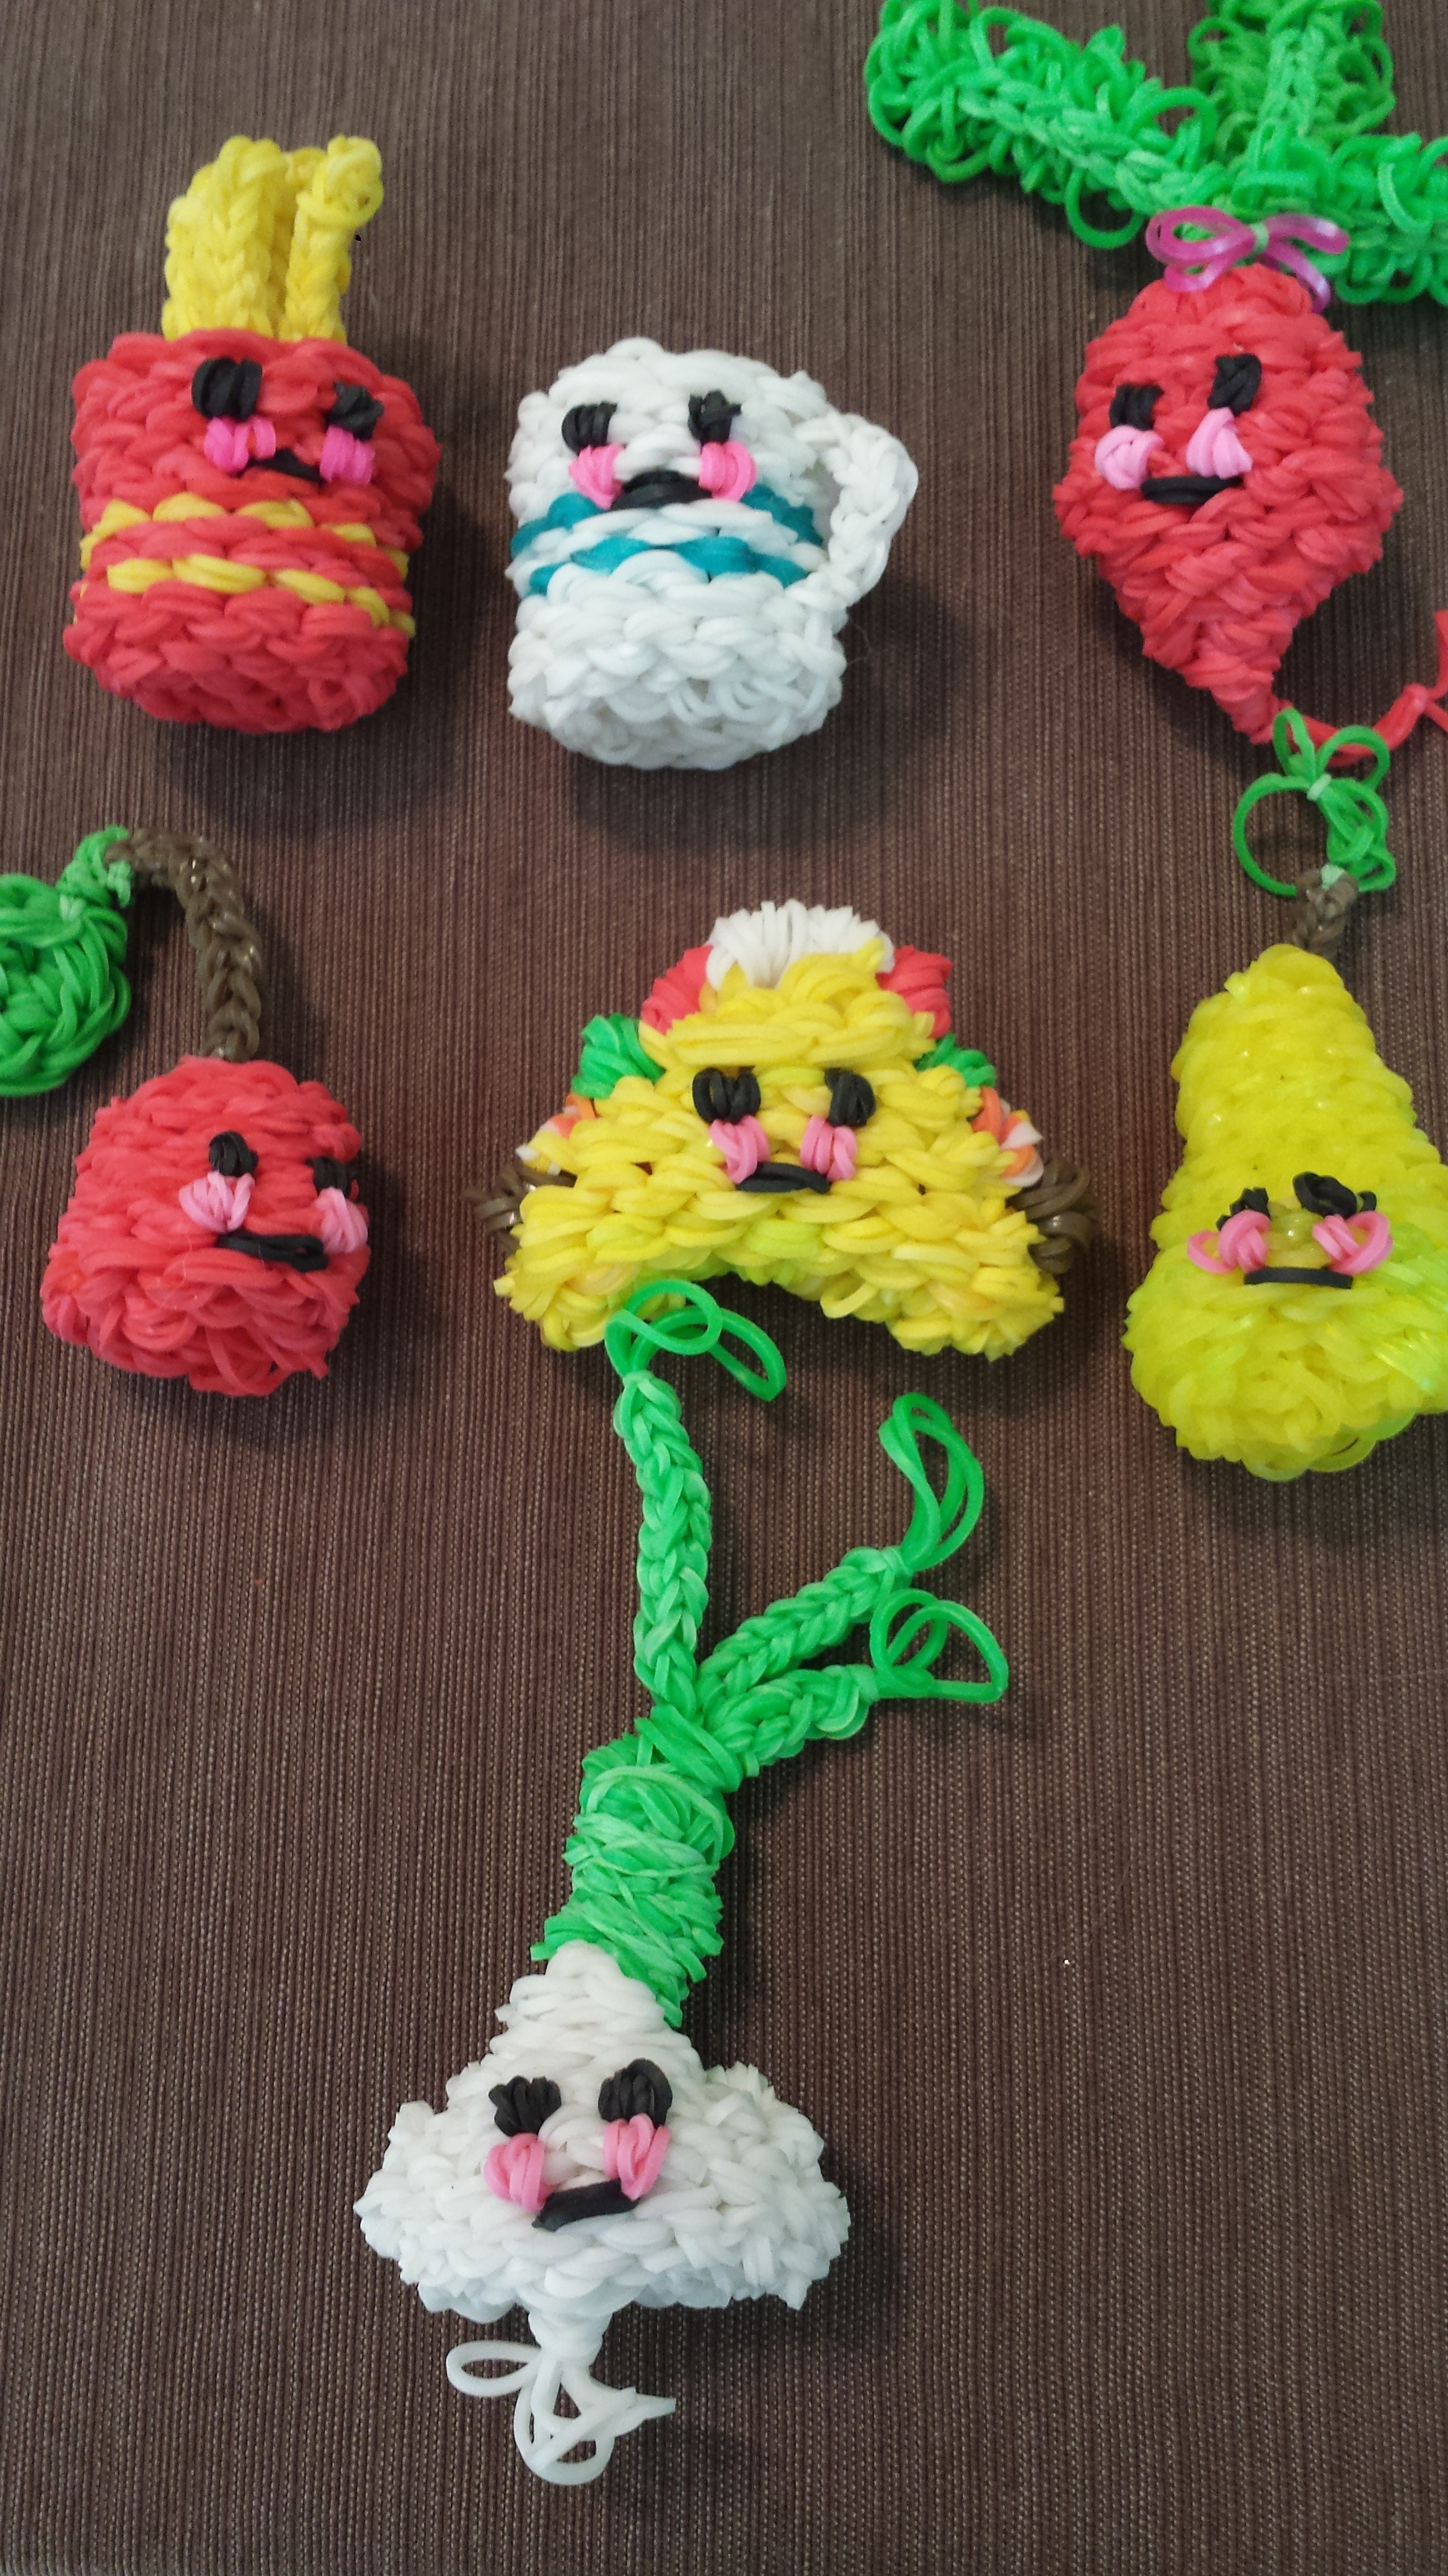 The New Members... Rainbow Loom Charms